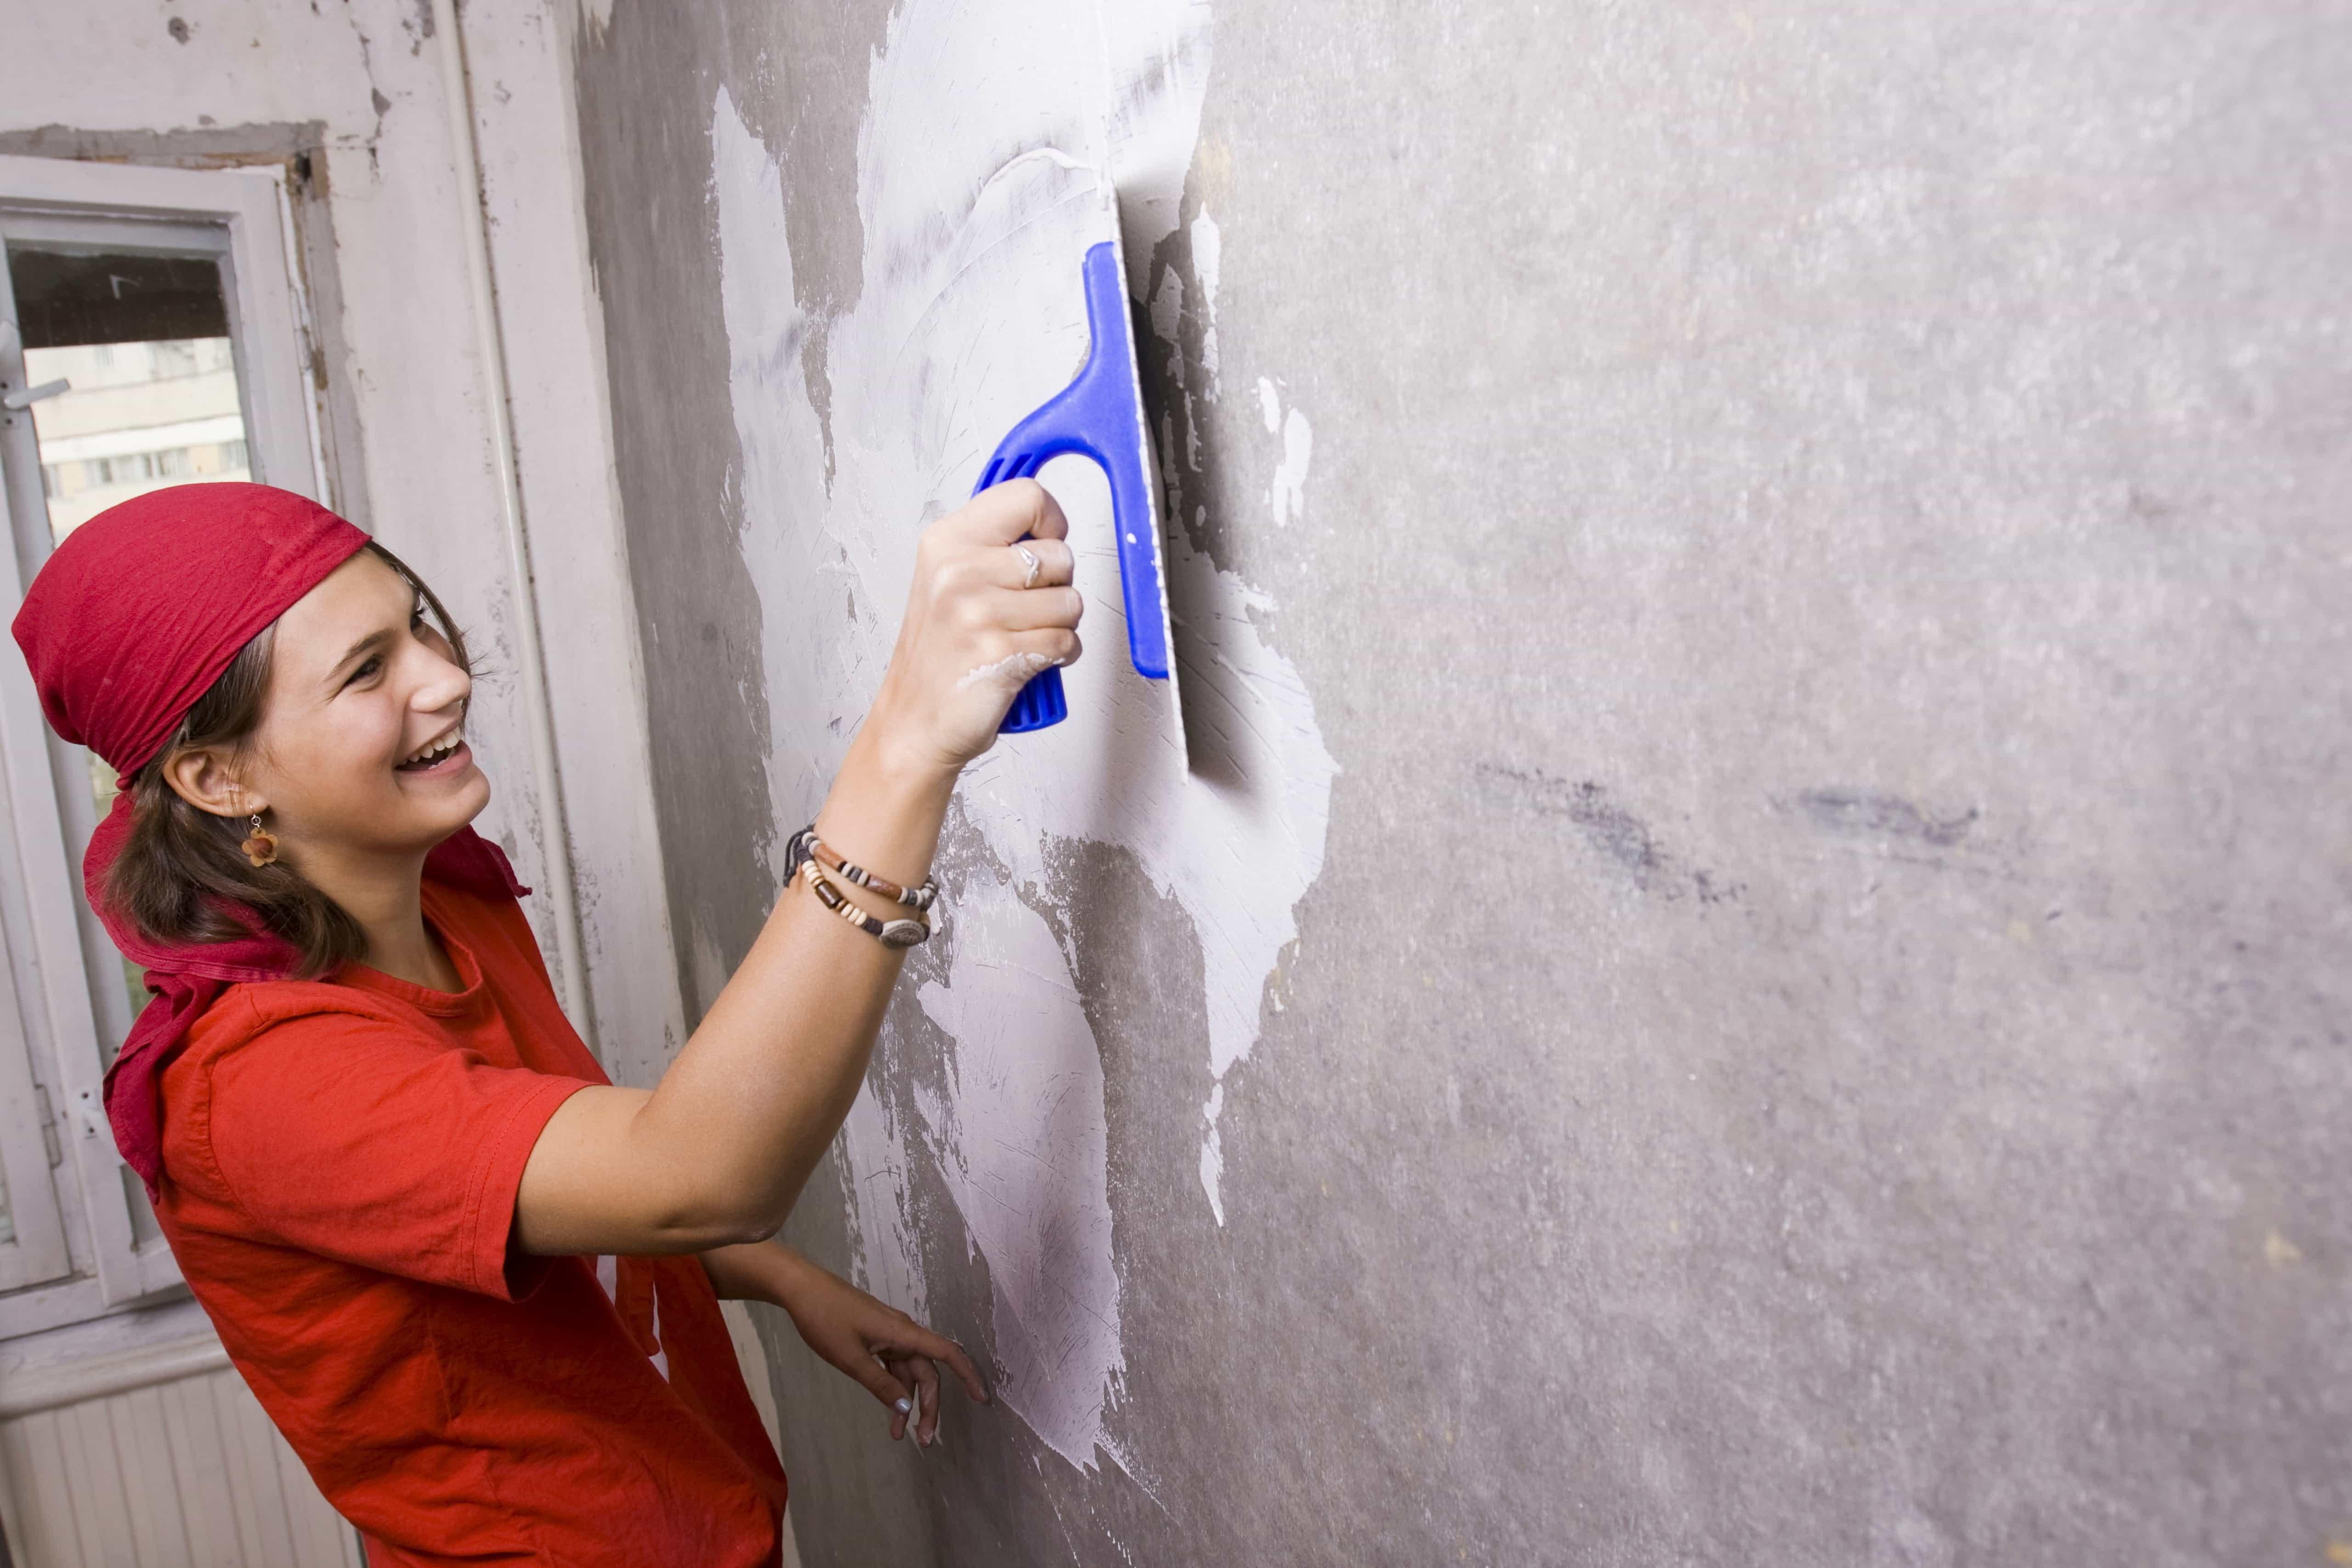 Girl_Repairing_Wall_000003974199.jpg